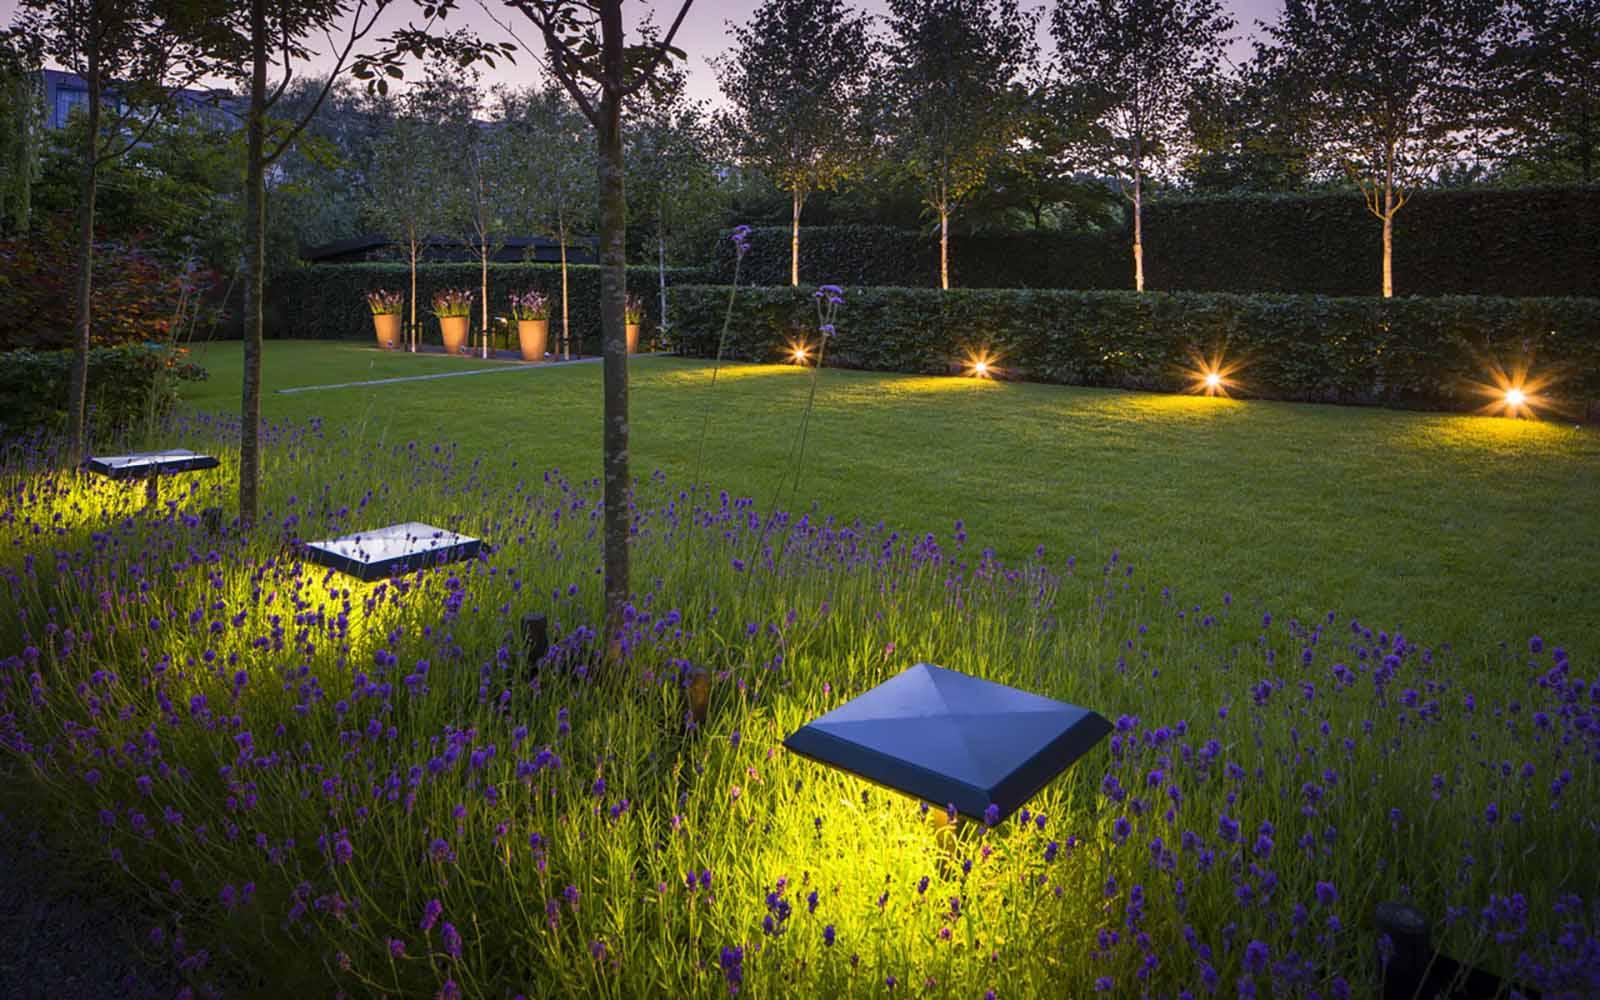 martin veltkamp tuinen, martin veltkamp, the art of living, tuinverlichting